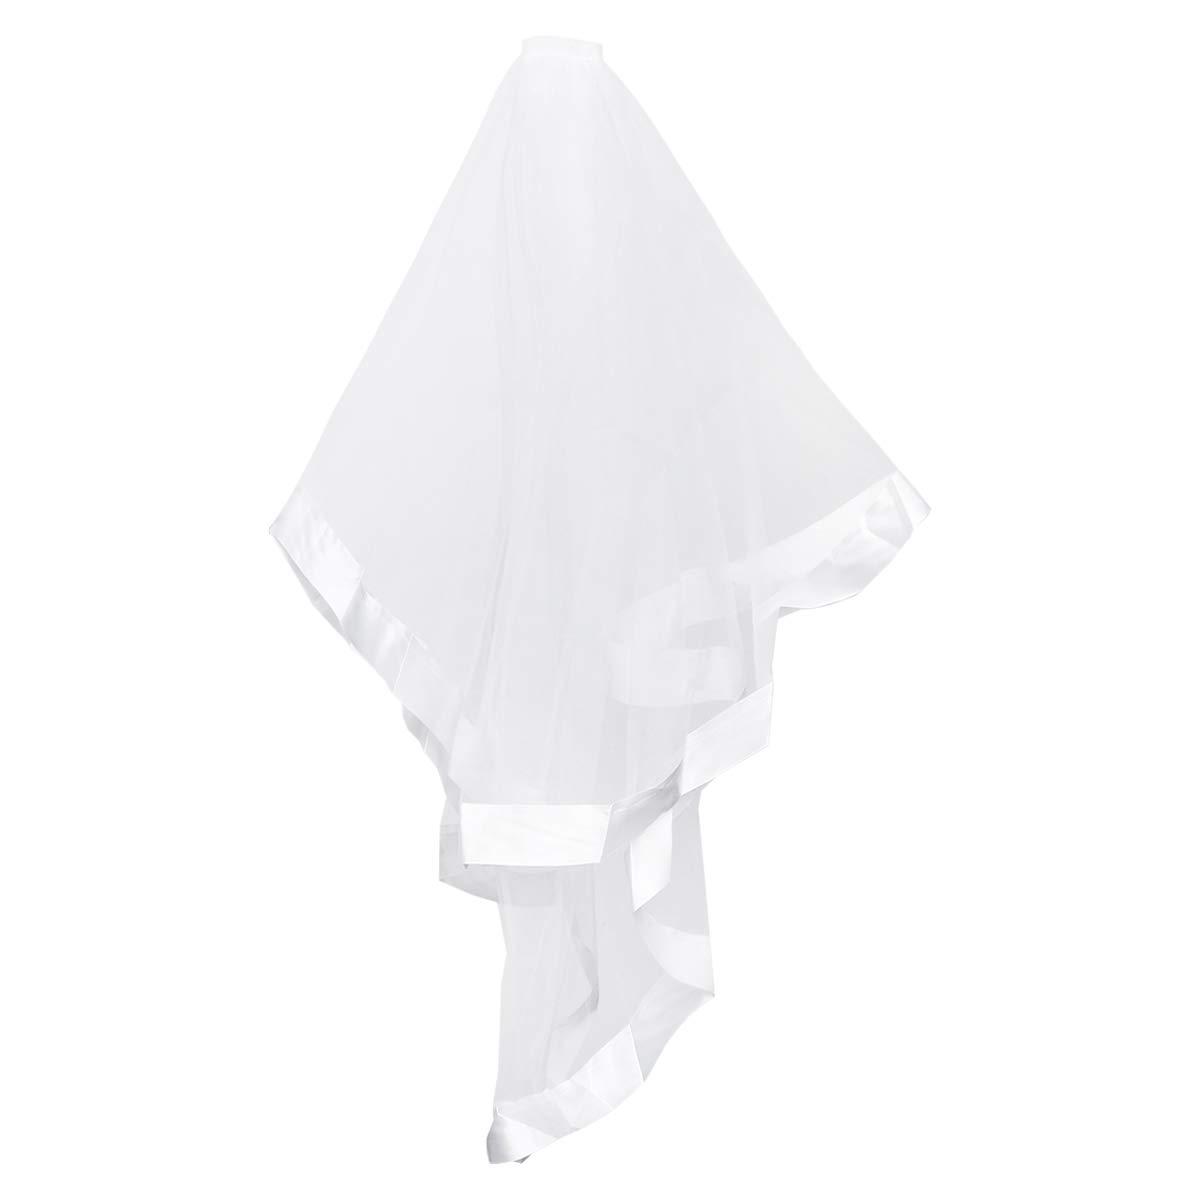 Amosfun Gauze Veil Beautiful Elegant Double Tier Fluffy Decor Veil with Comb for Bride Woman Lady 80cm White